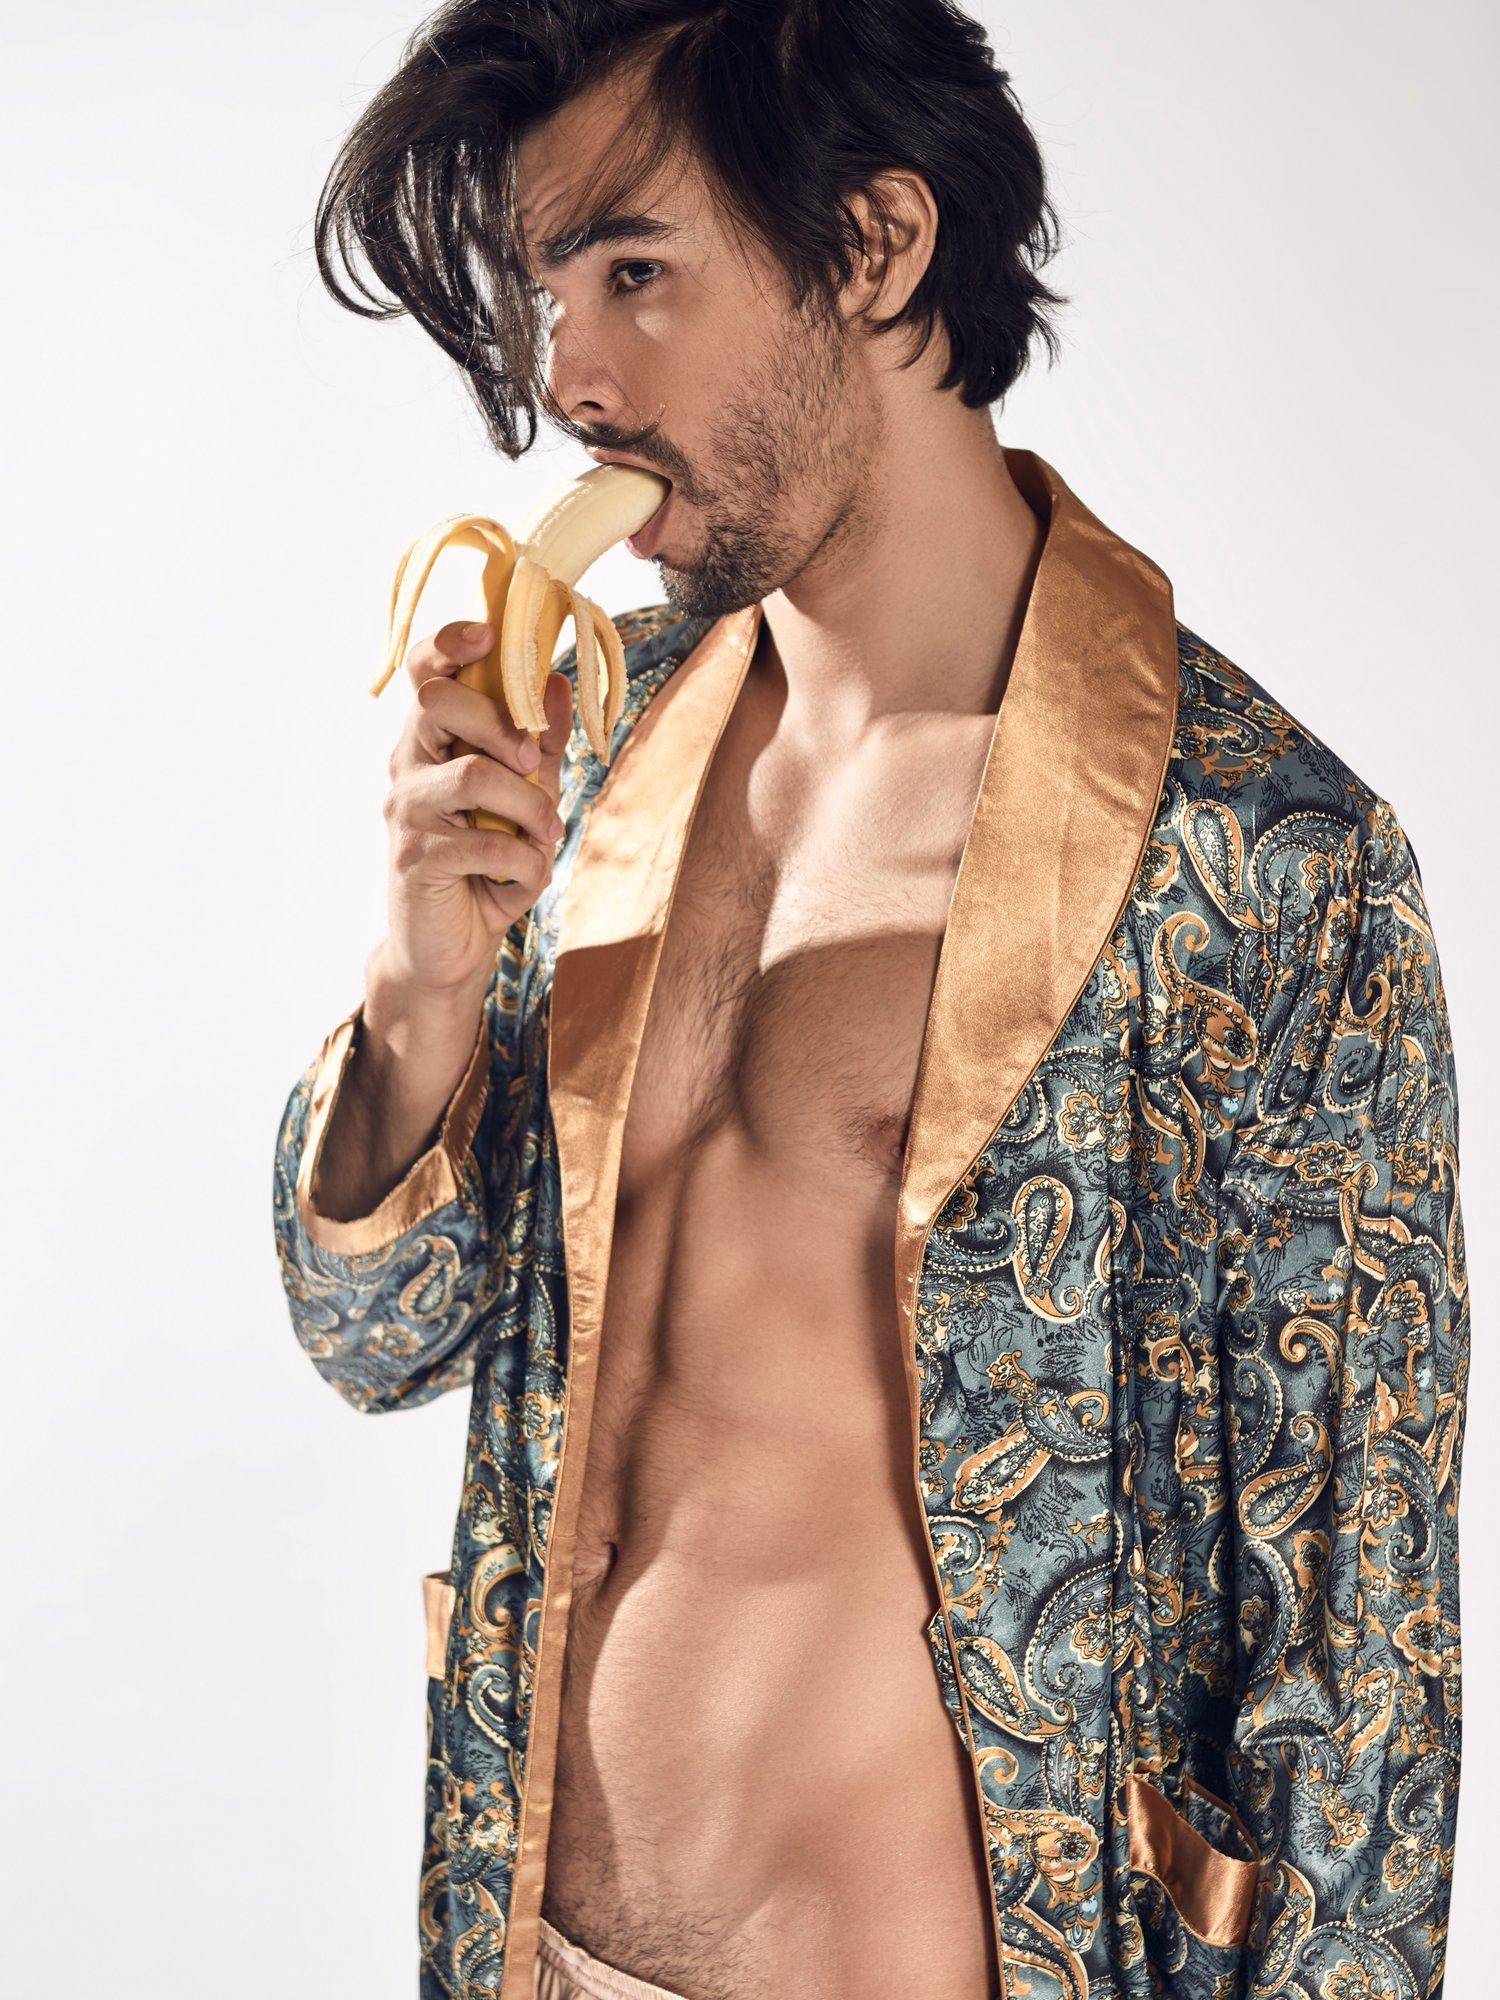 Adon Exclusive: Model Fábio Toledo By Caio Ferreira